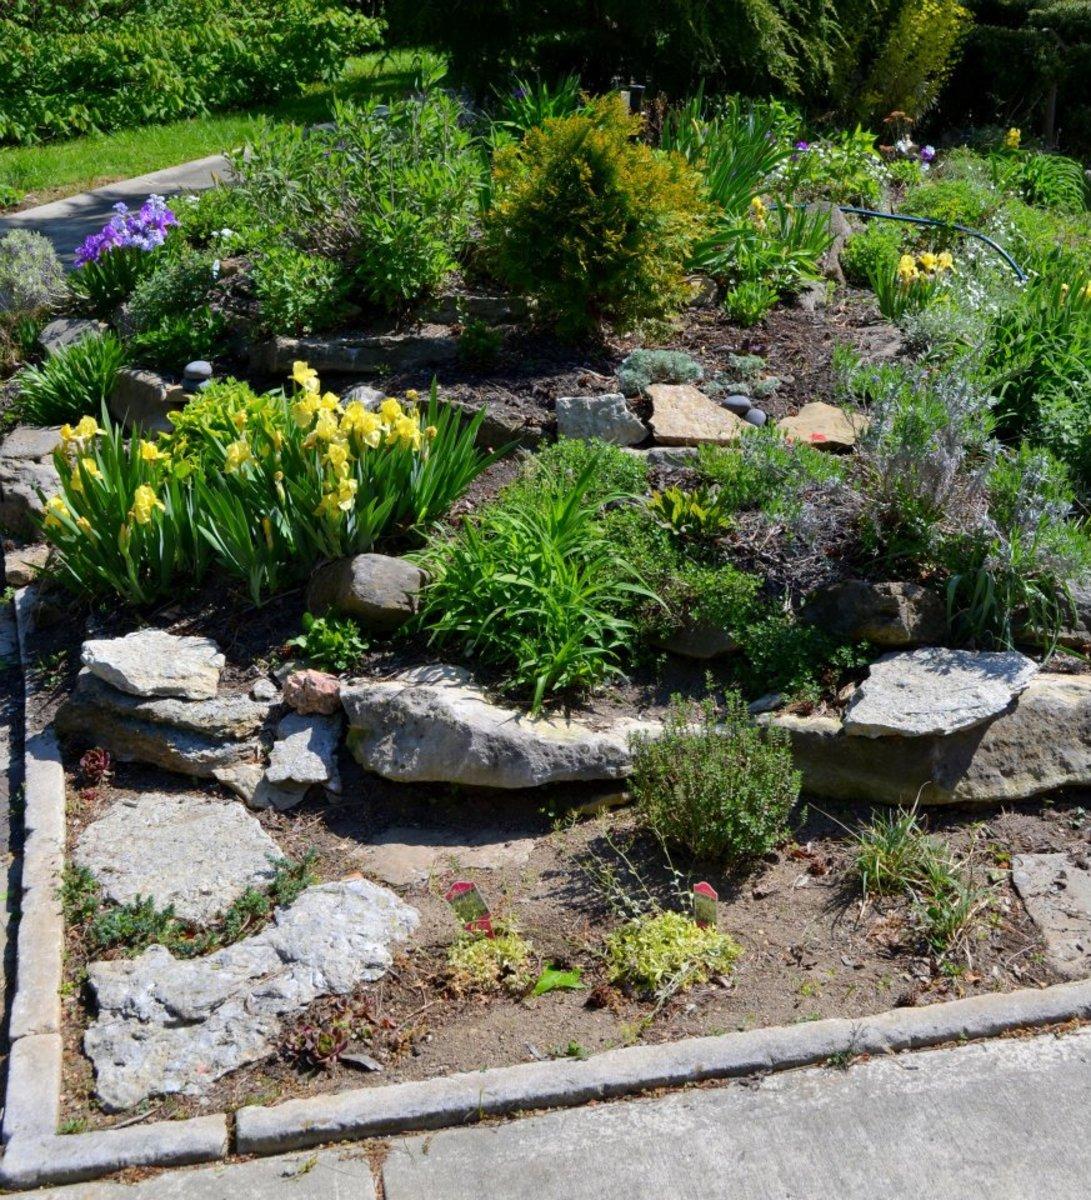 Rejuvenating the Rock Garden with the help of fellow park gardeners.